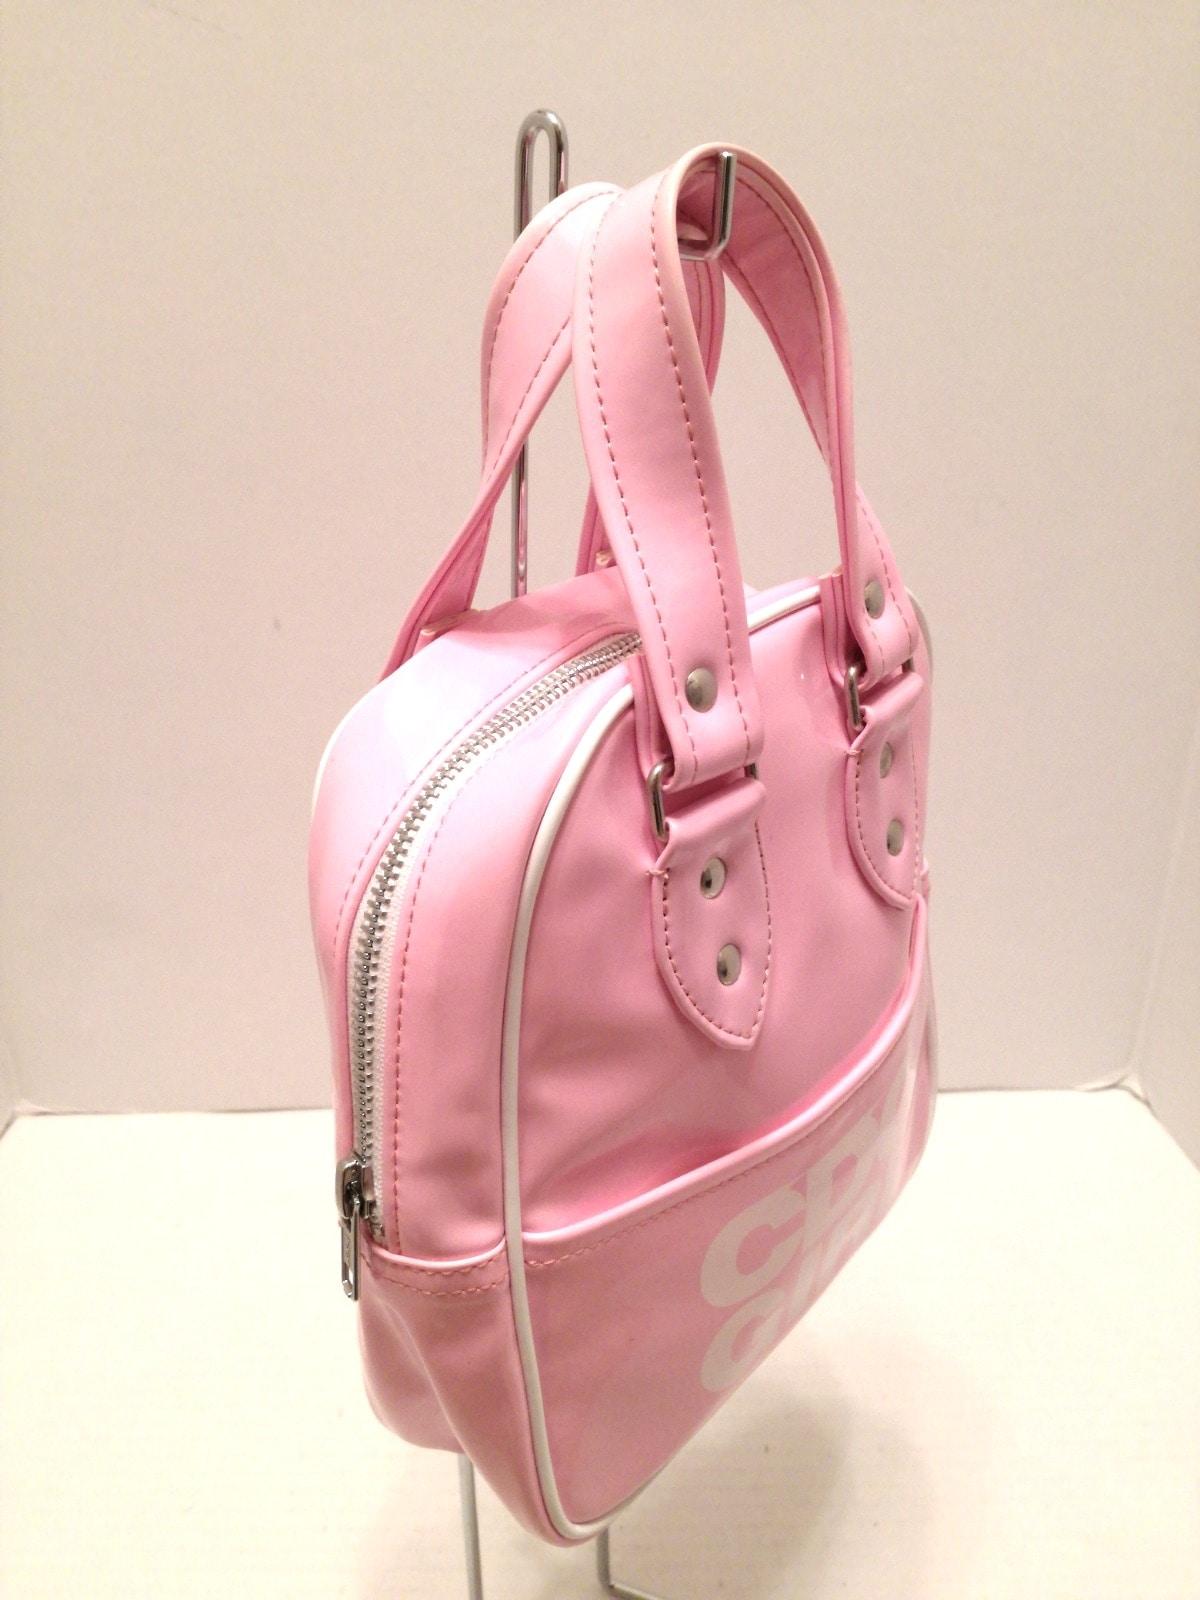 COMME des GARCONS GIRL(コムデギャルソンガール)のハンドバッグ